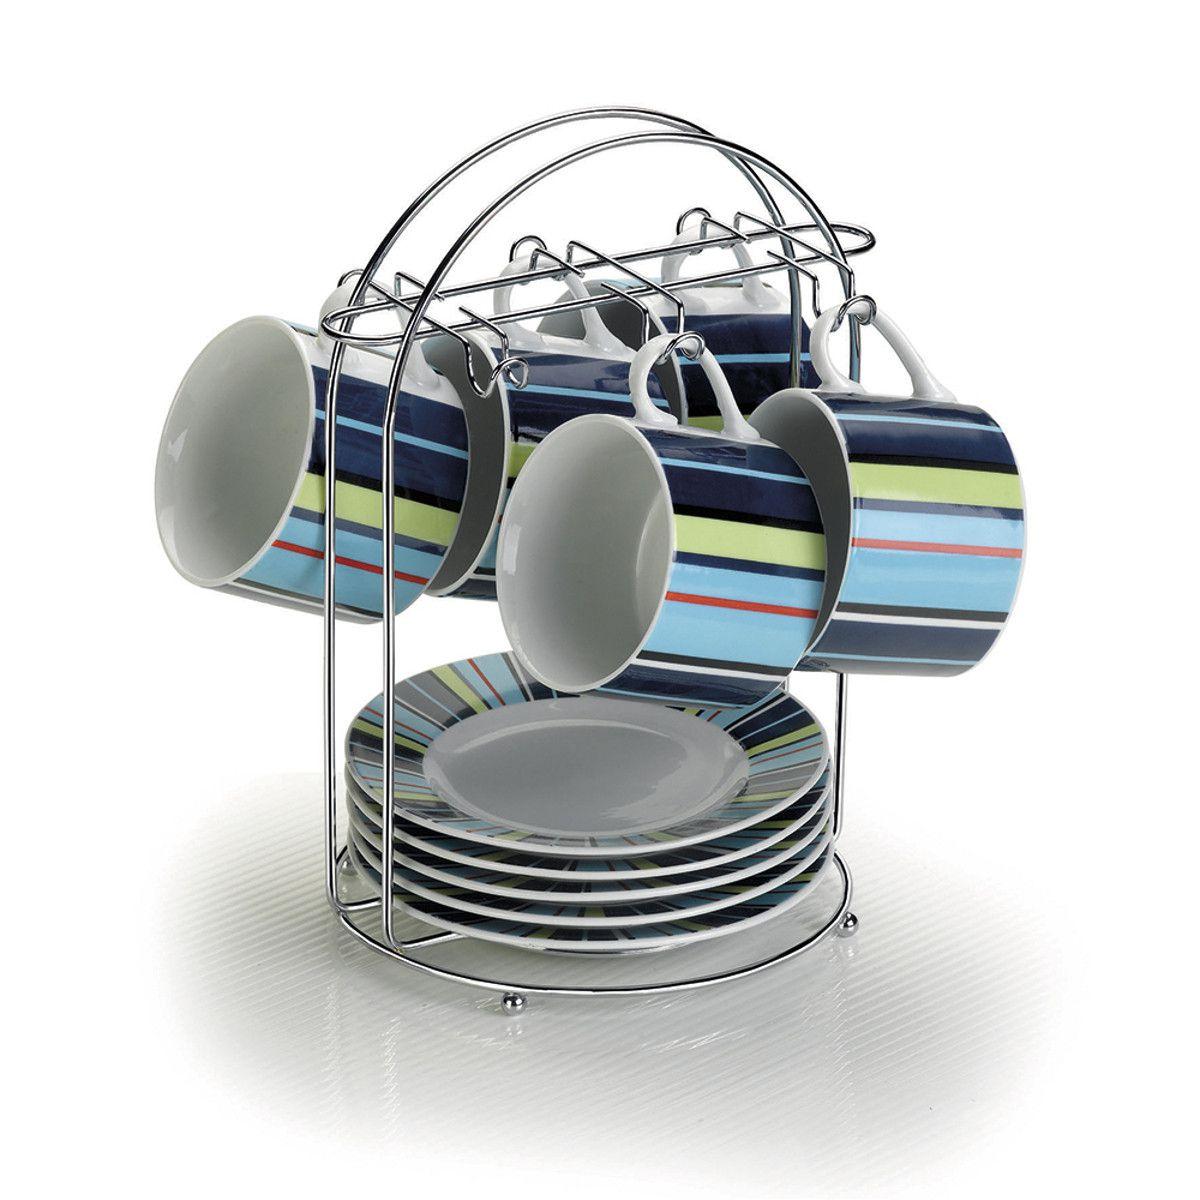 Porta 6 Xícaras de Chá e Pires Suporte Organizador - Arthi